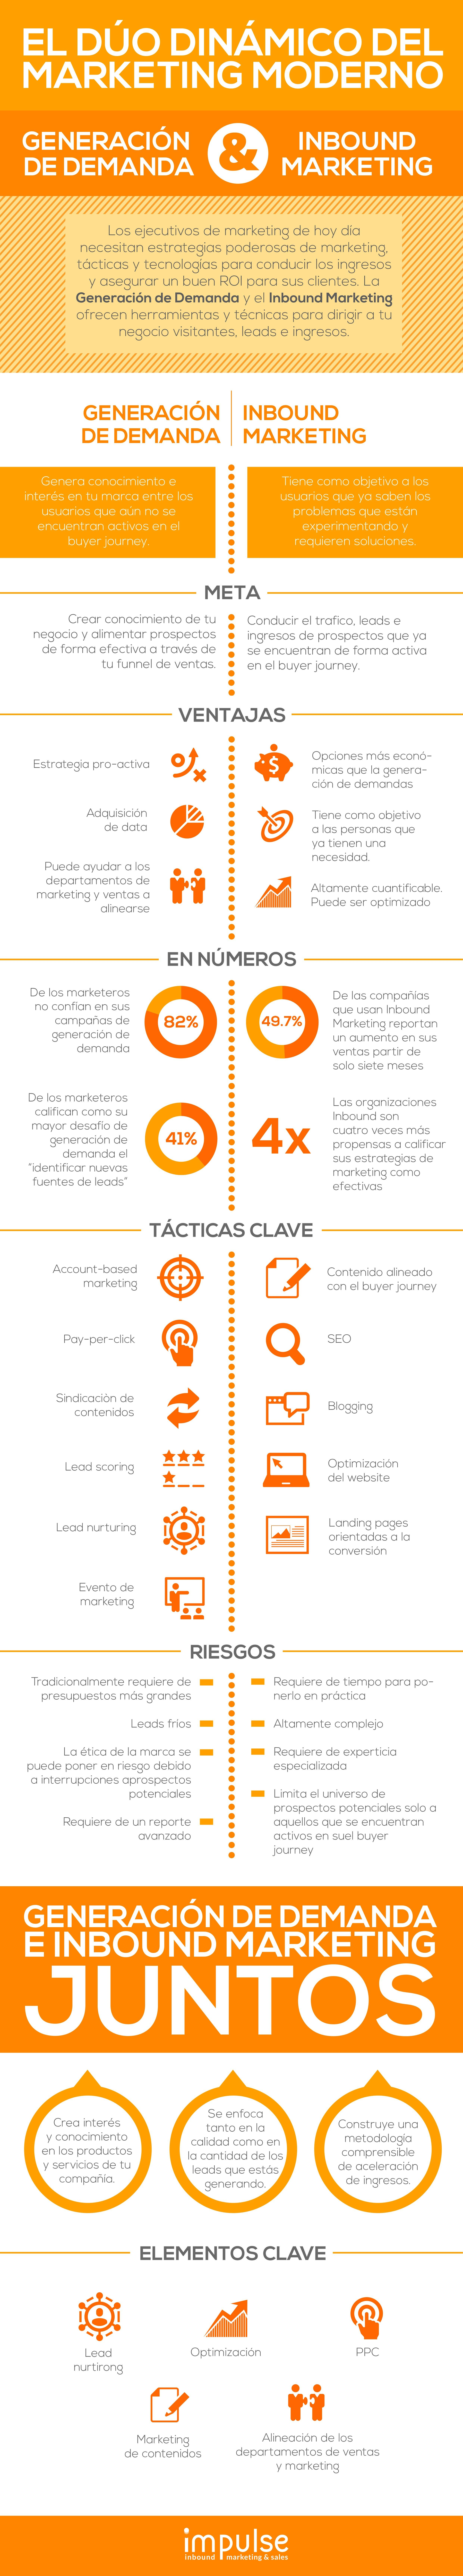 Infografia-DuoDinamico-Generacion-de-demanda-Inbound-Marketing.jpg